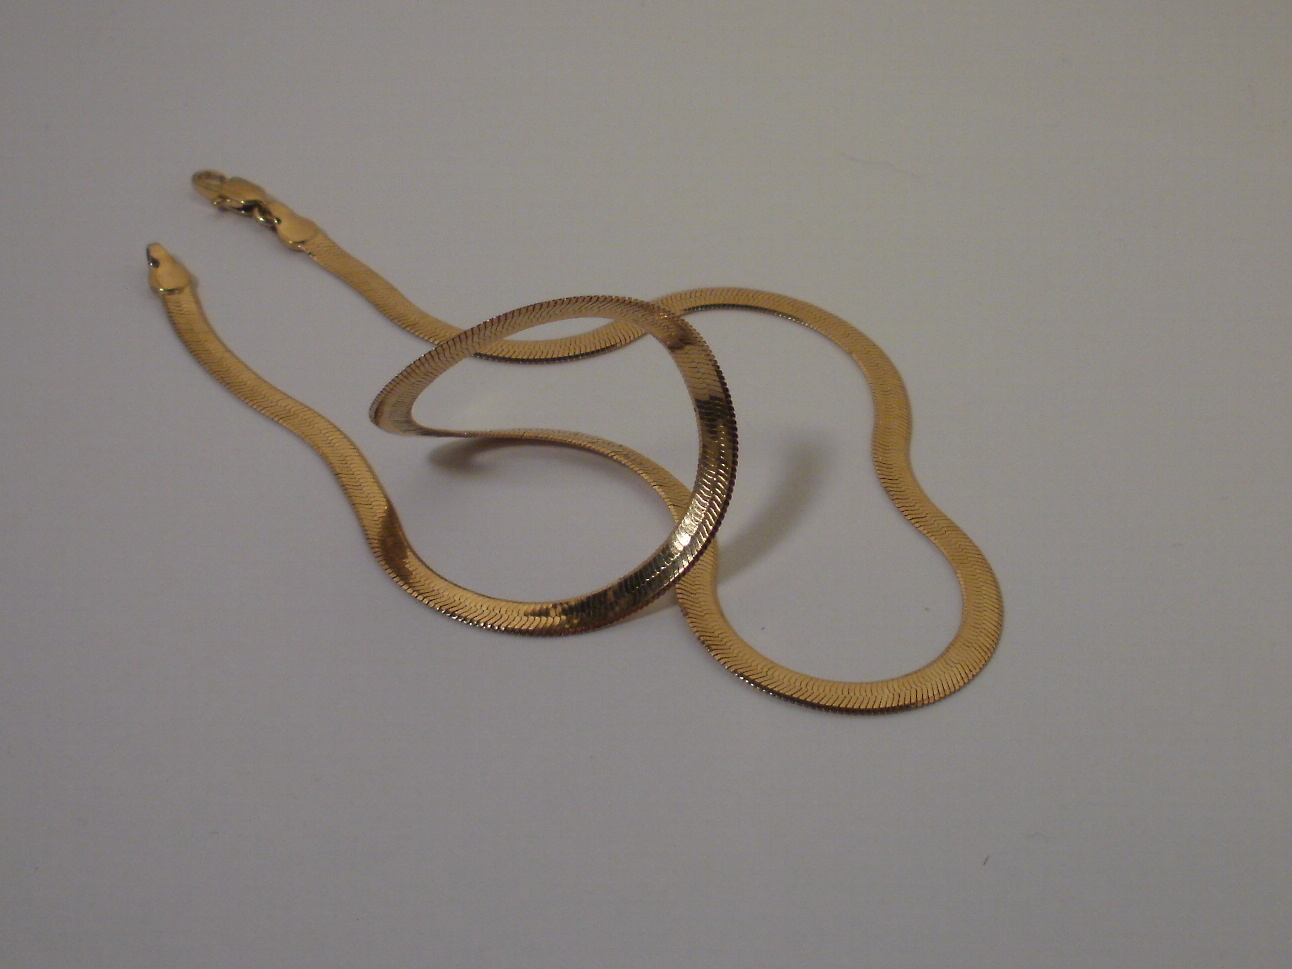 14K Yellow Gold overlay Flex Herringbone necklace